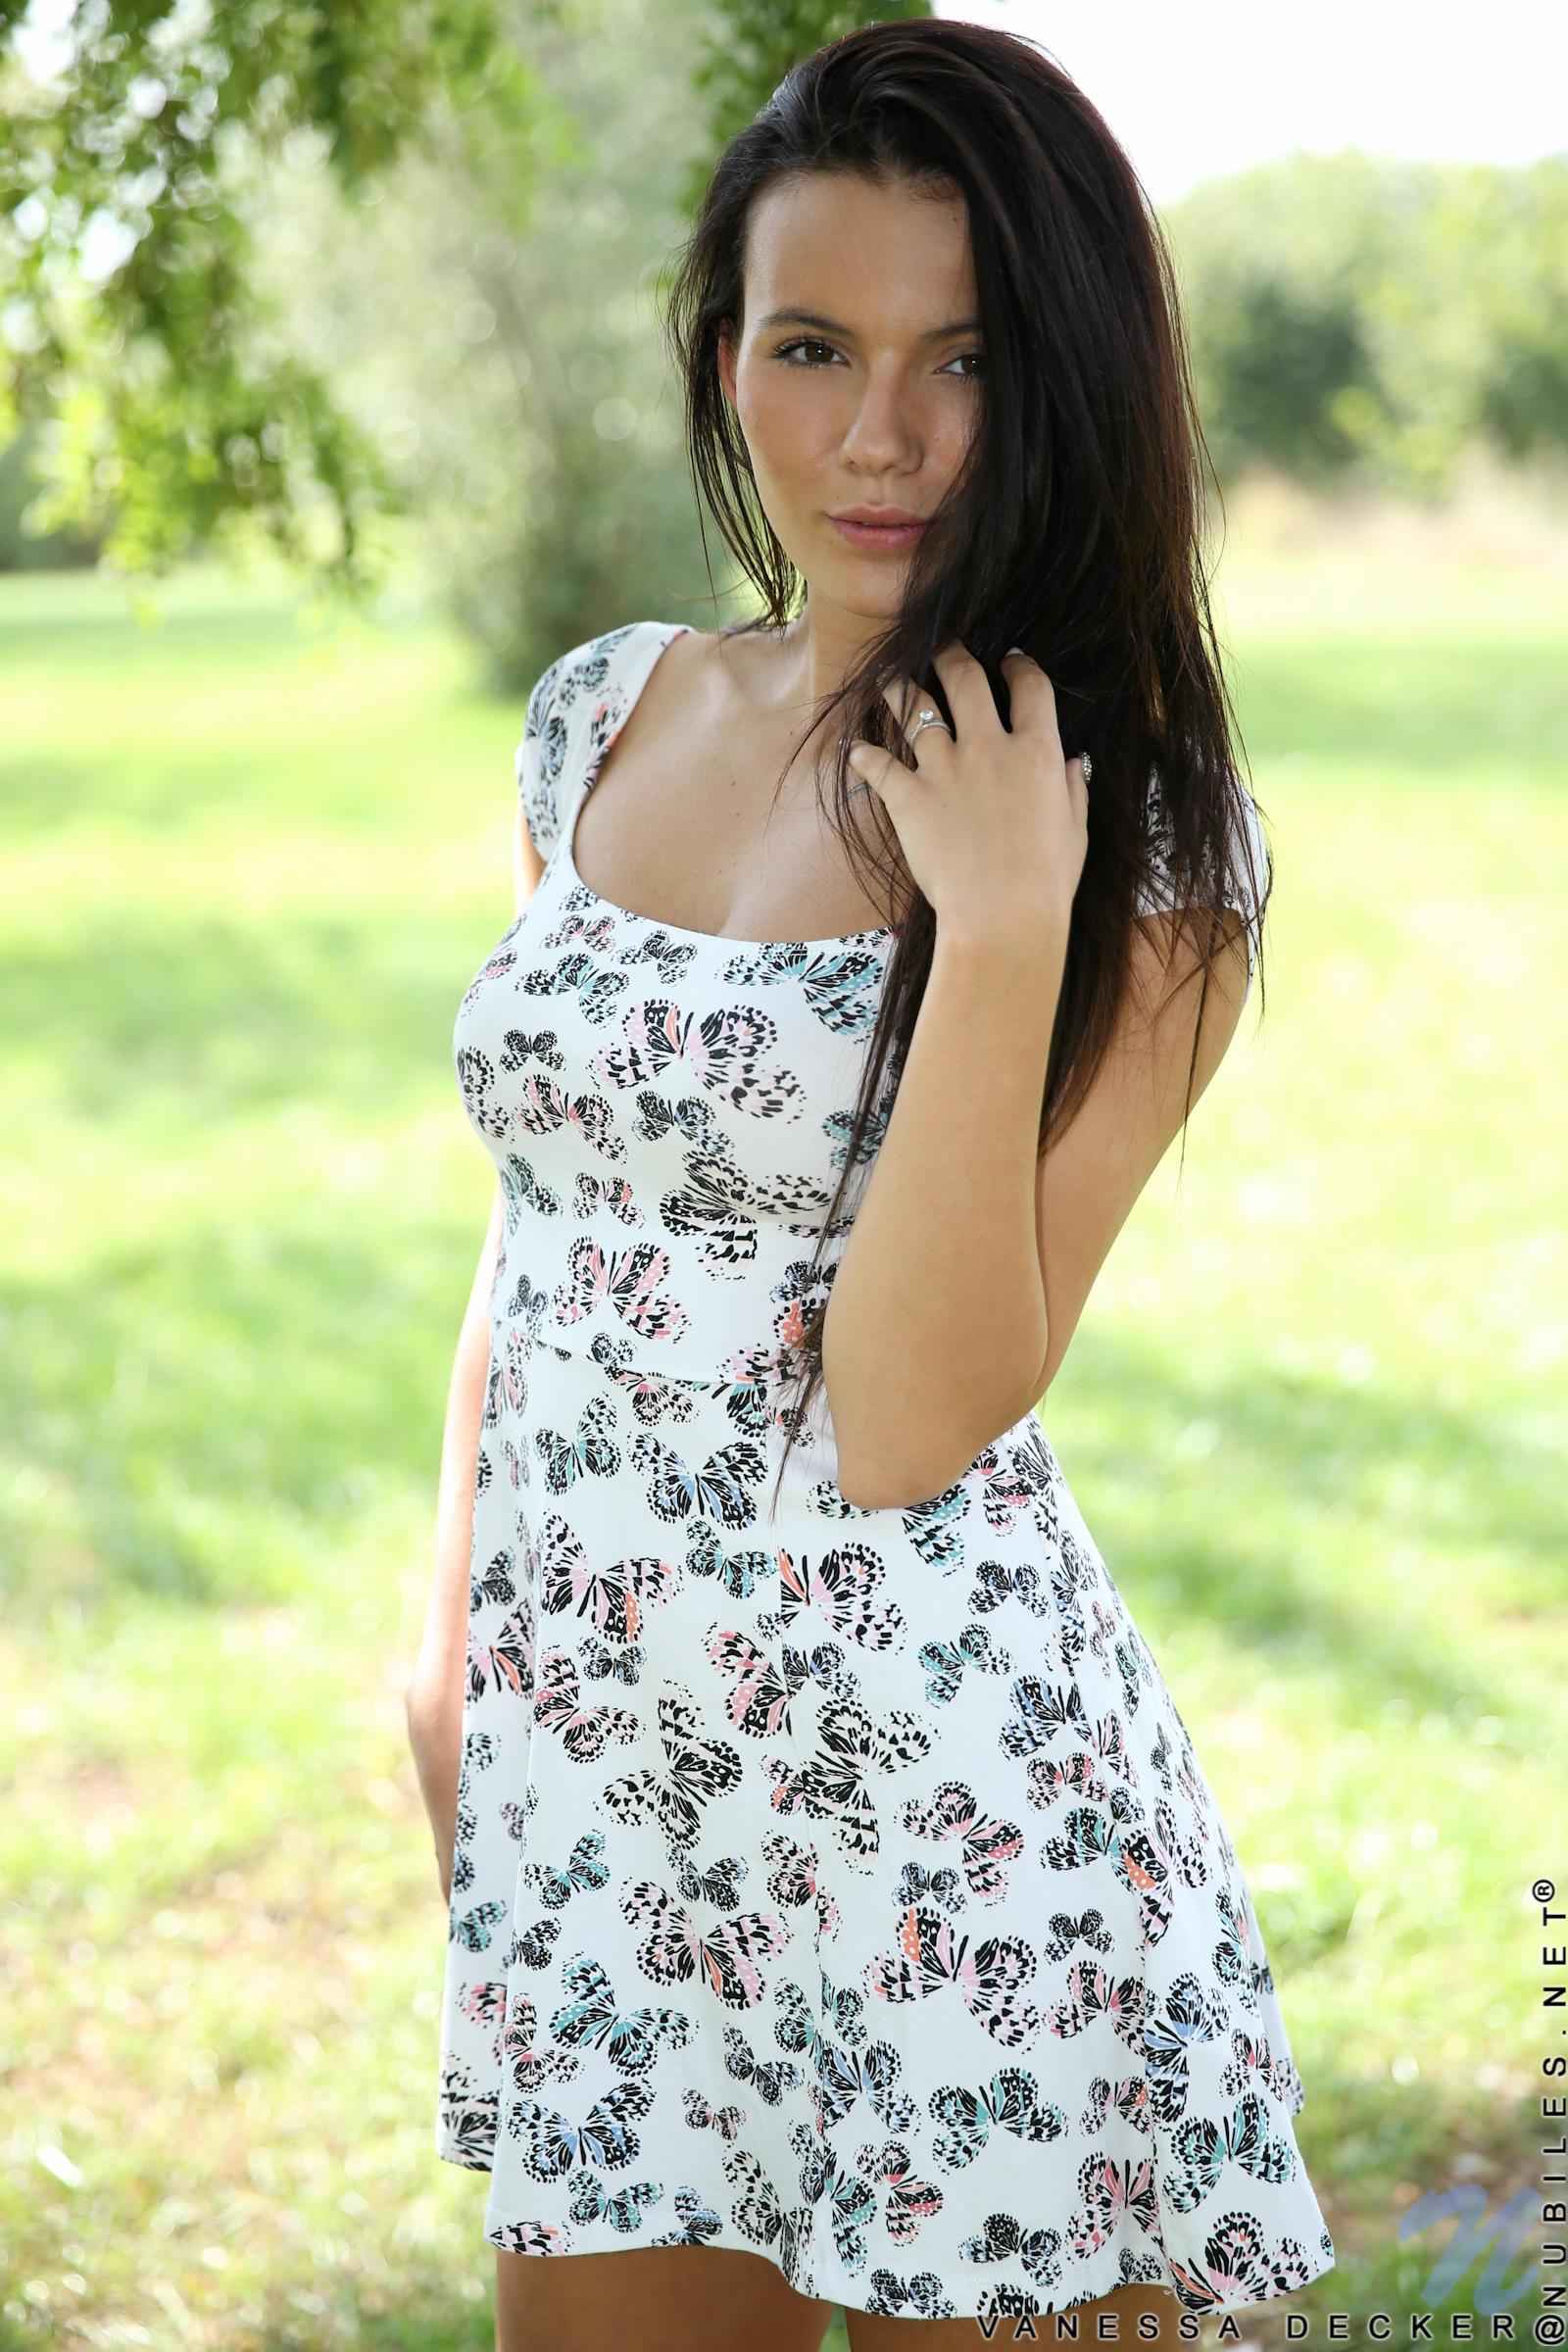 Vanessa Decker Hd